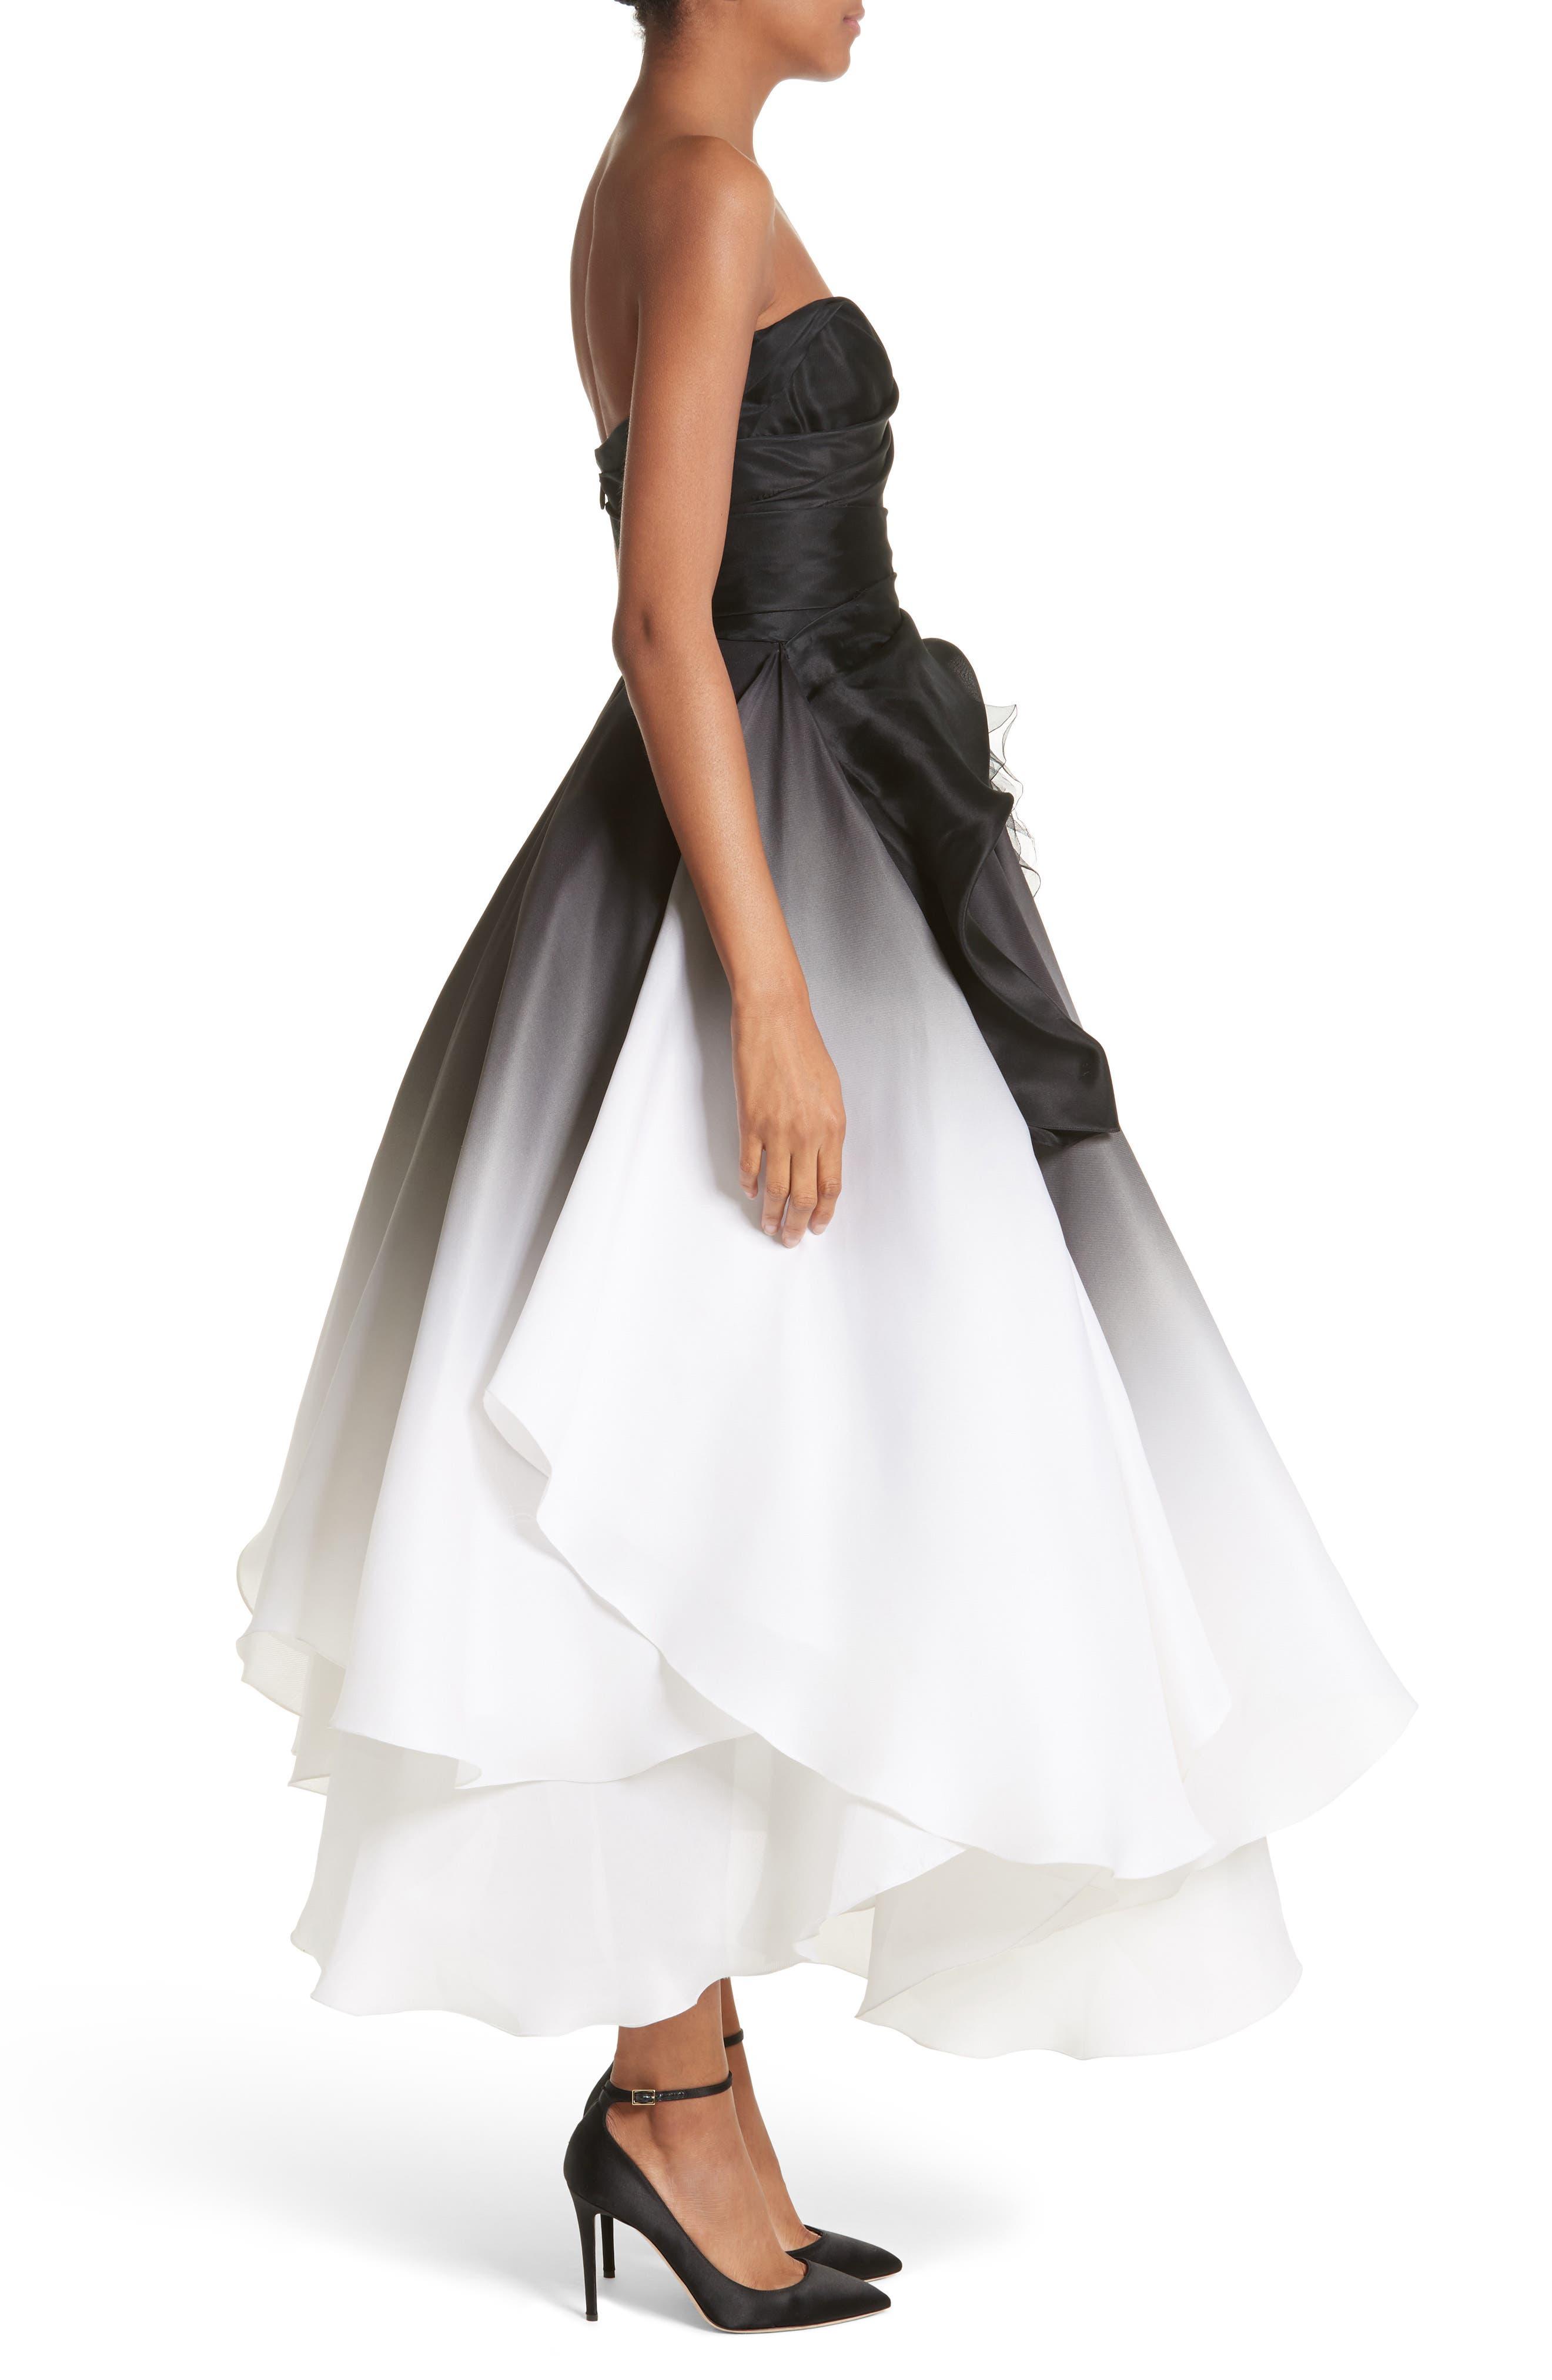 Ombré Strapless Tea Length Dress,                             Alternate thumbnail 4, color,                             Black/ White